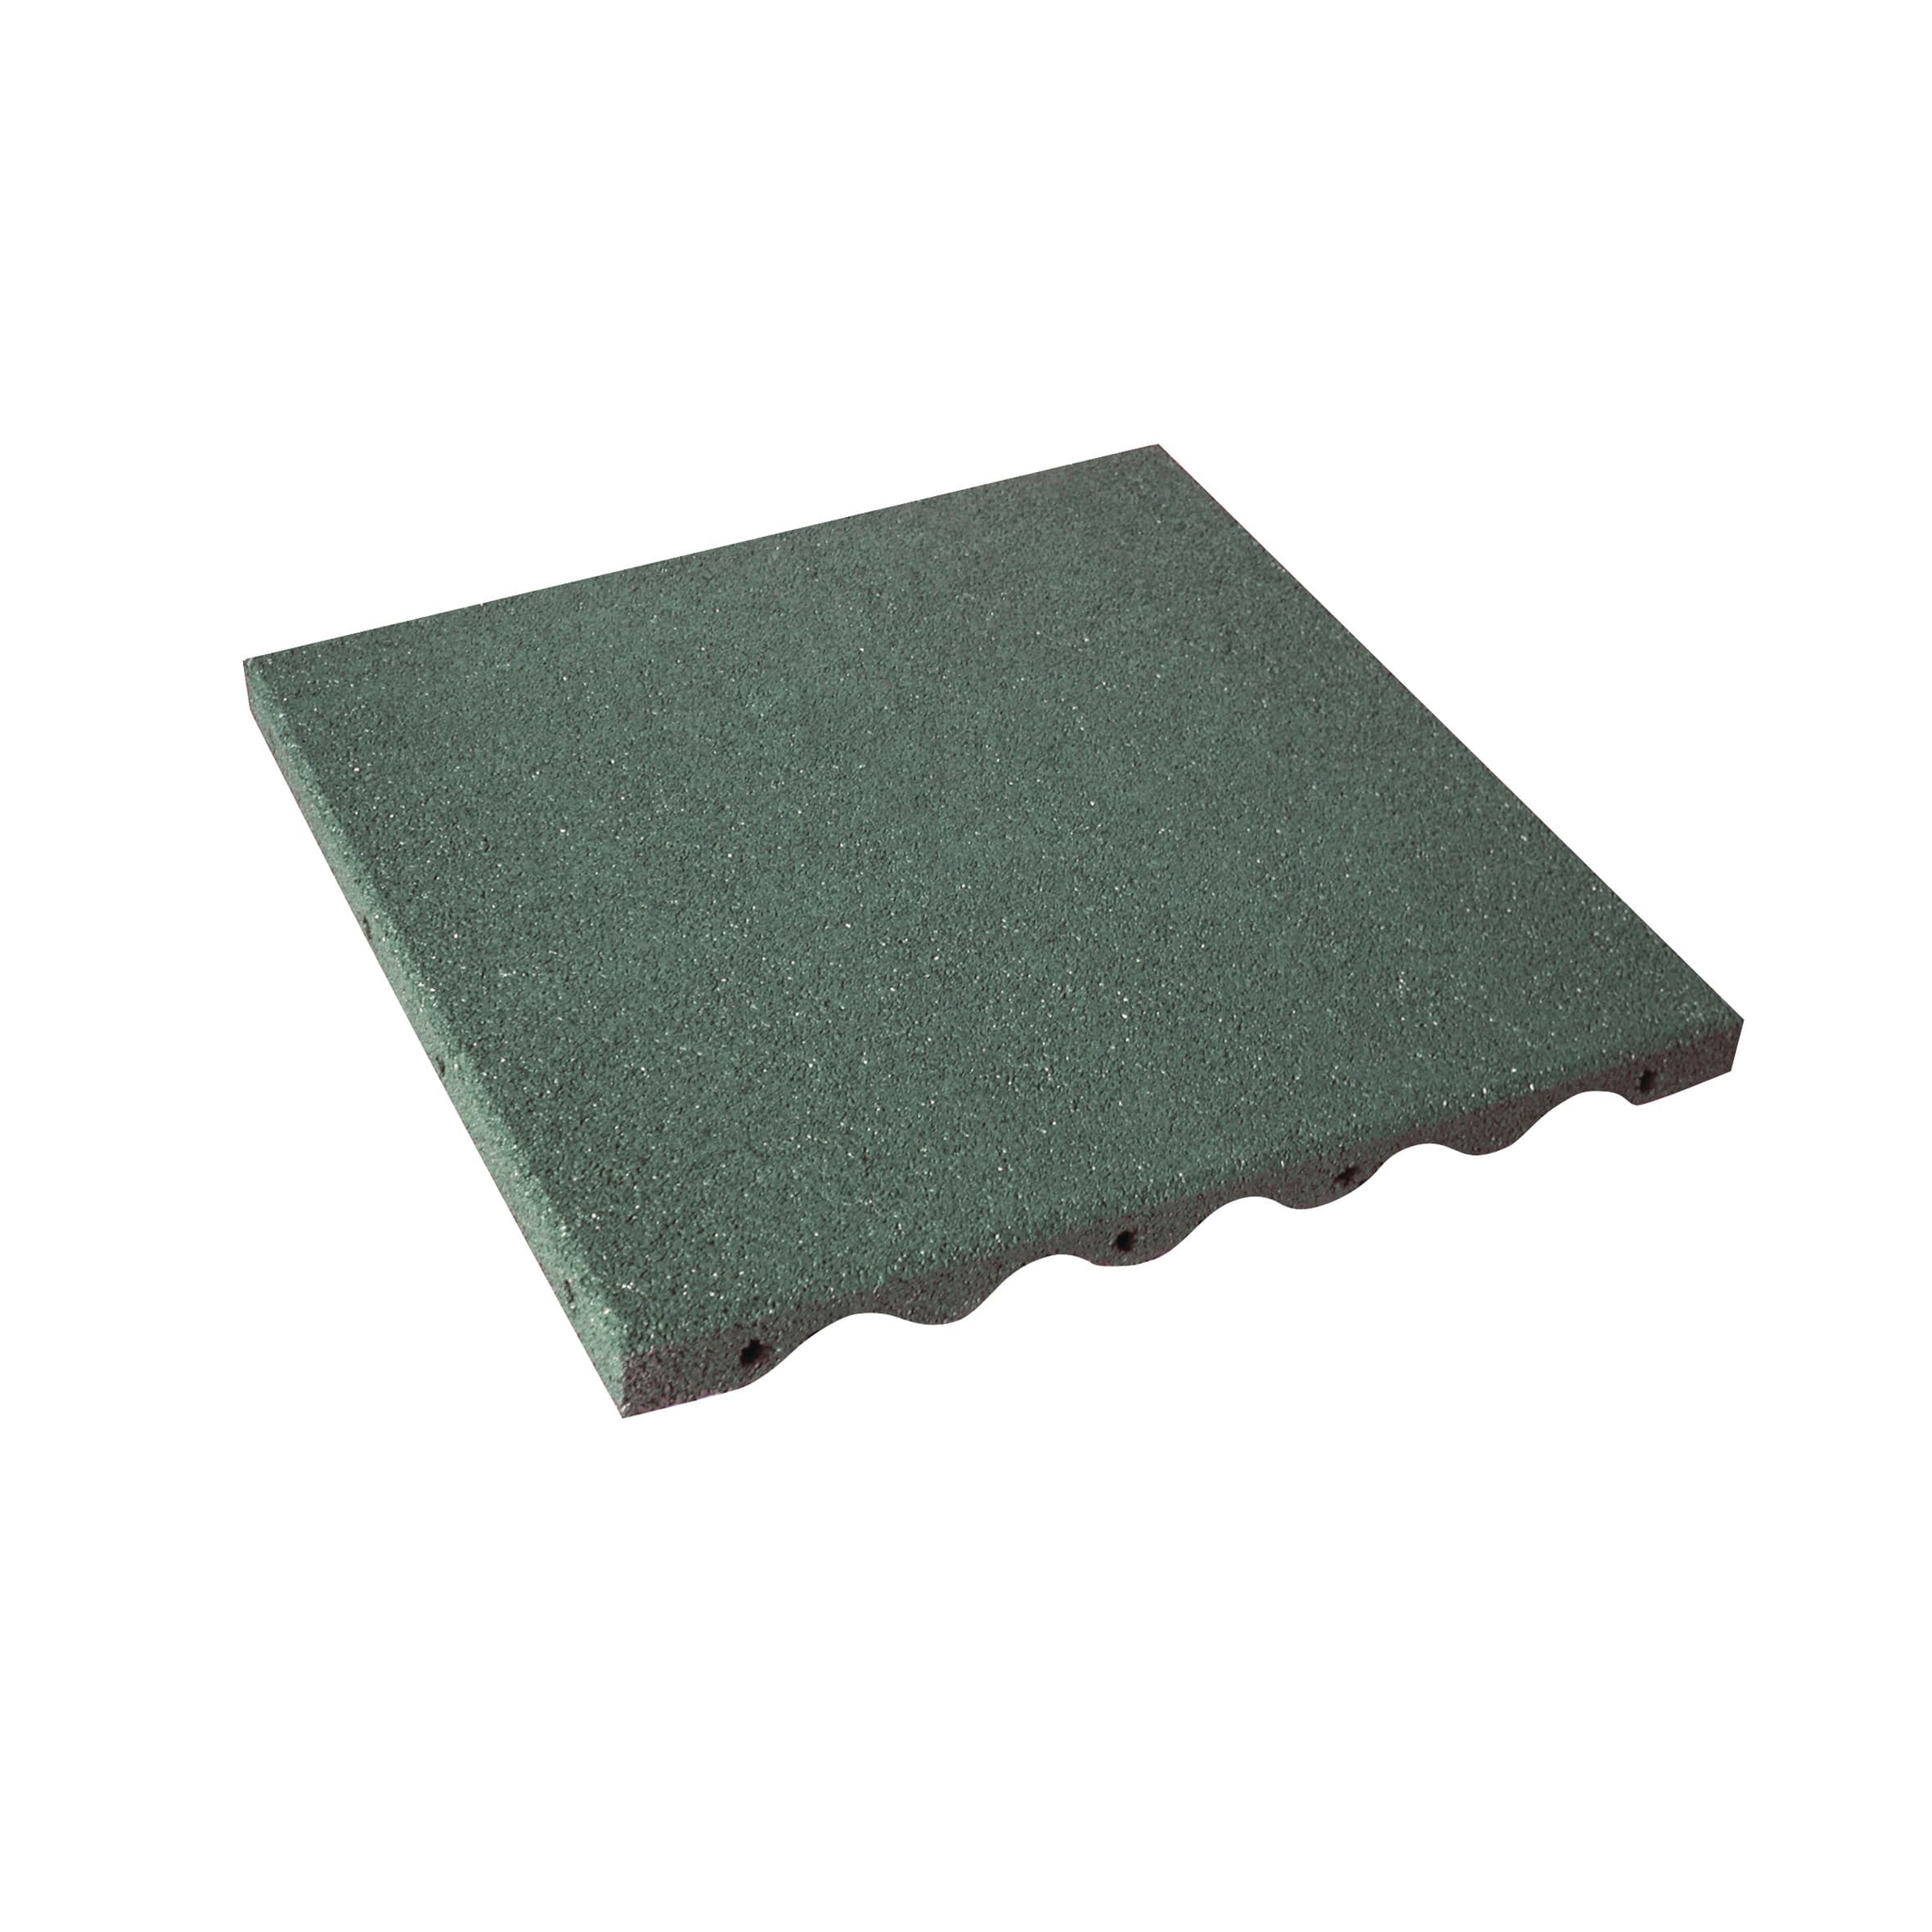 Piastrelle Plastica Giardino Leroy Merlin.Piastrelle Ad Incastro In Caucciu 50 X 50 Cm Sp 35 Mm Verde Prezzo Online Leroy Merlin